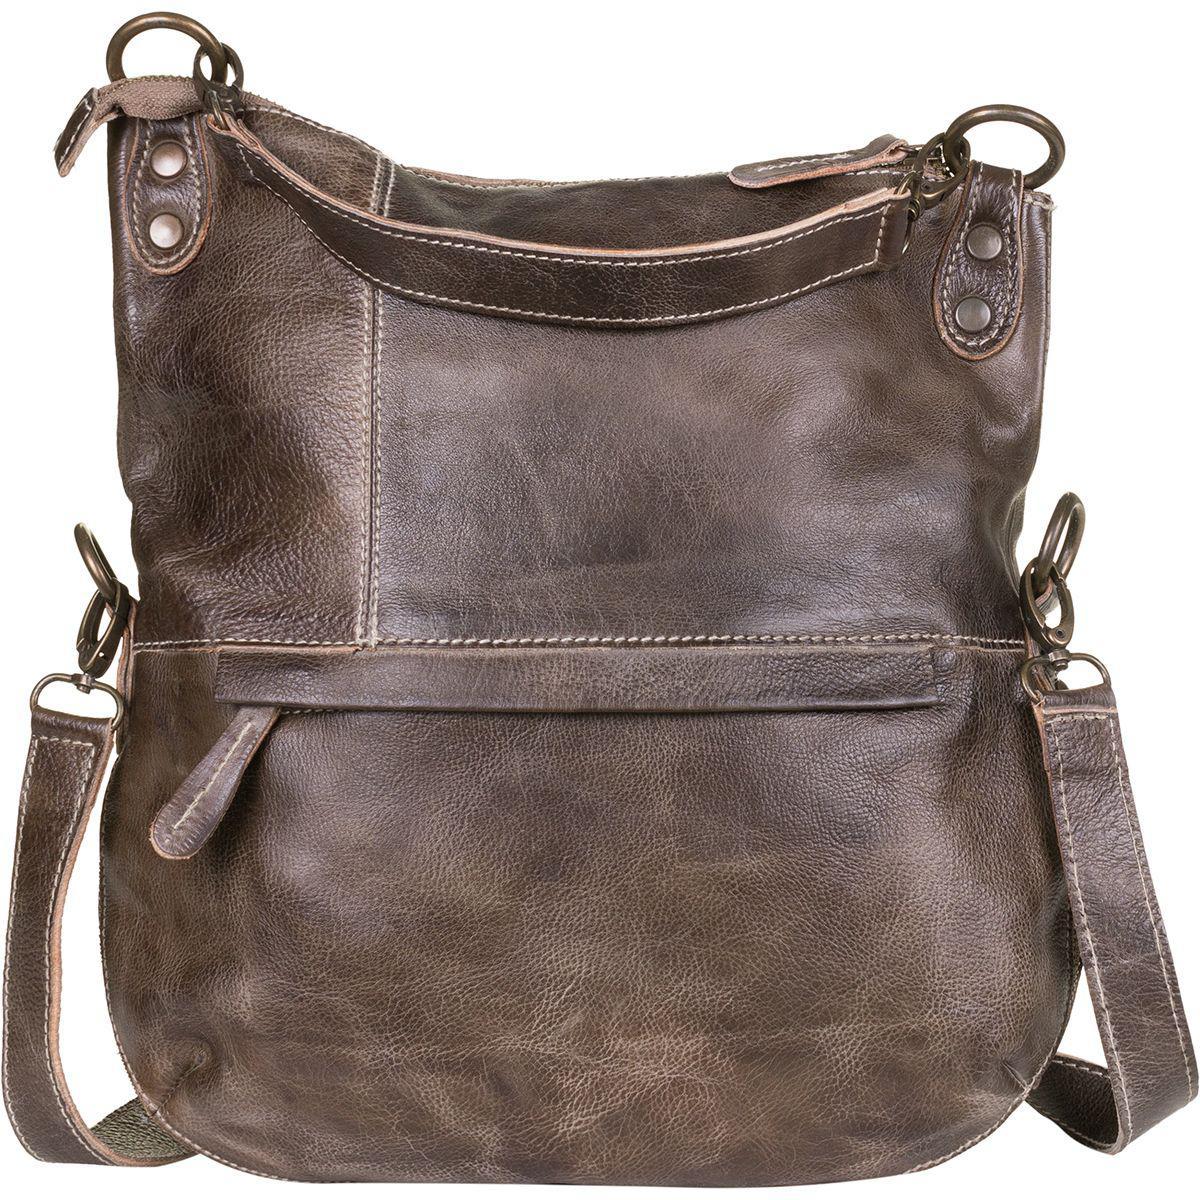 4f97cd3d45 Lyst - Bed Stu Tahiti Foldover Crossbody Bag in Brown